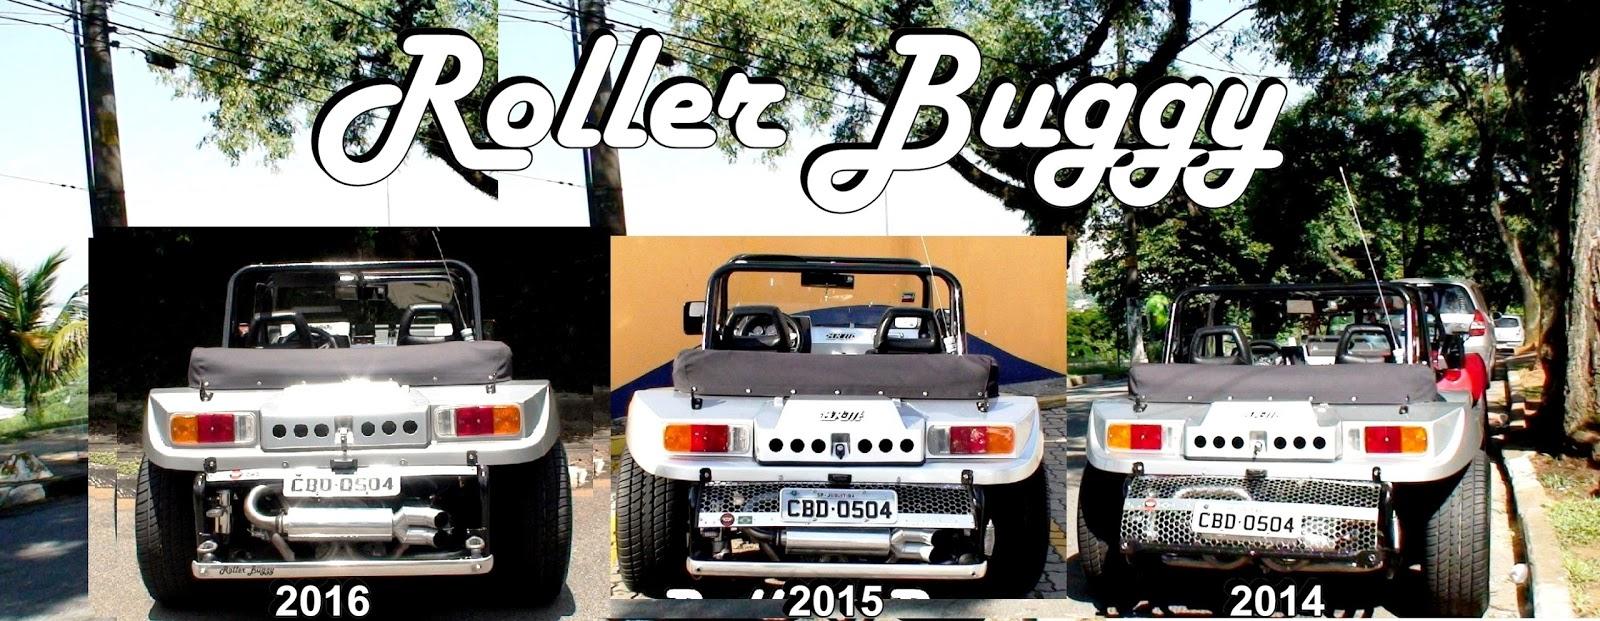 Roller Buggy - Página 15 DSC04677-12